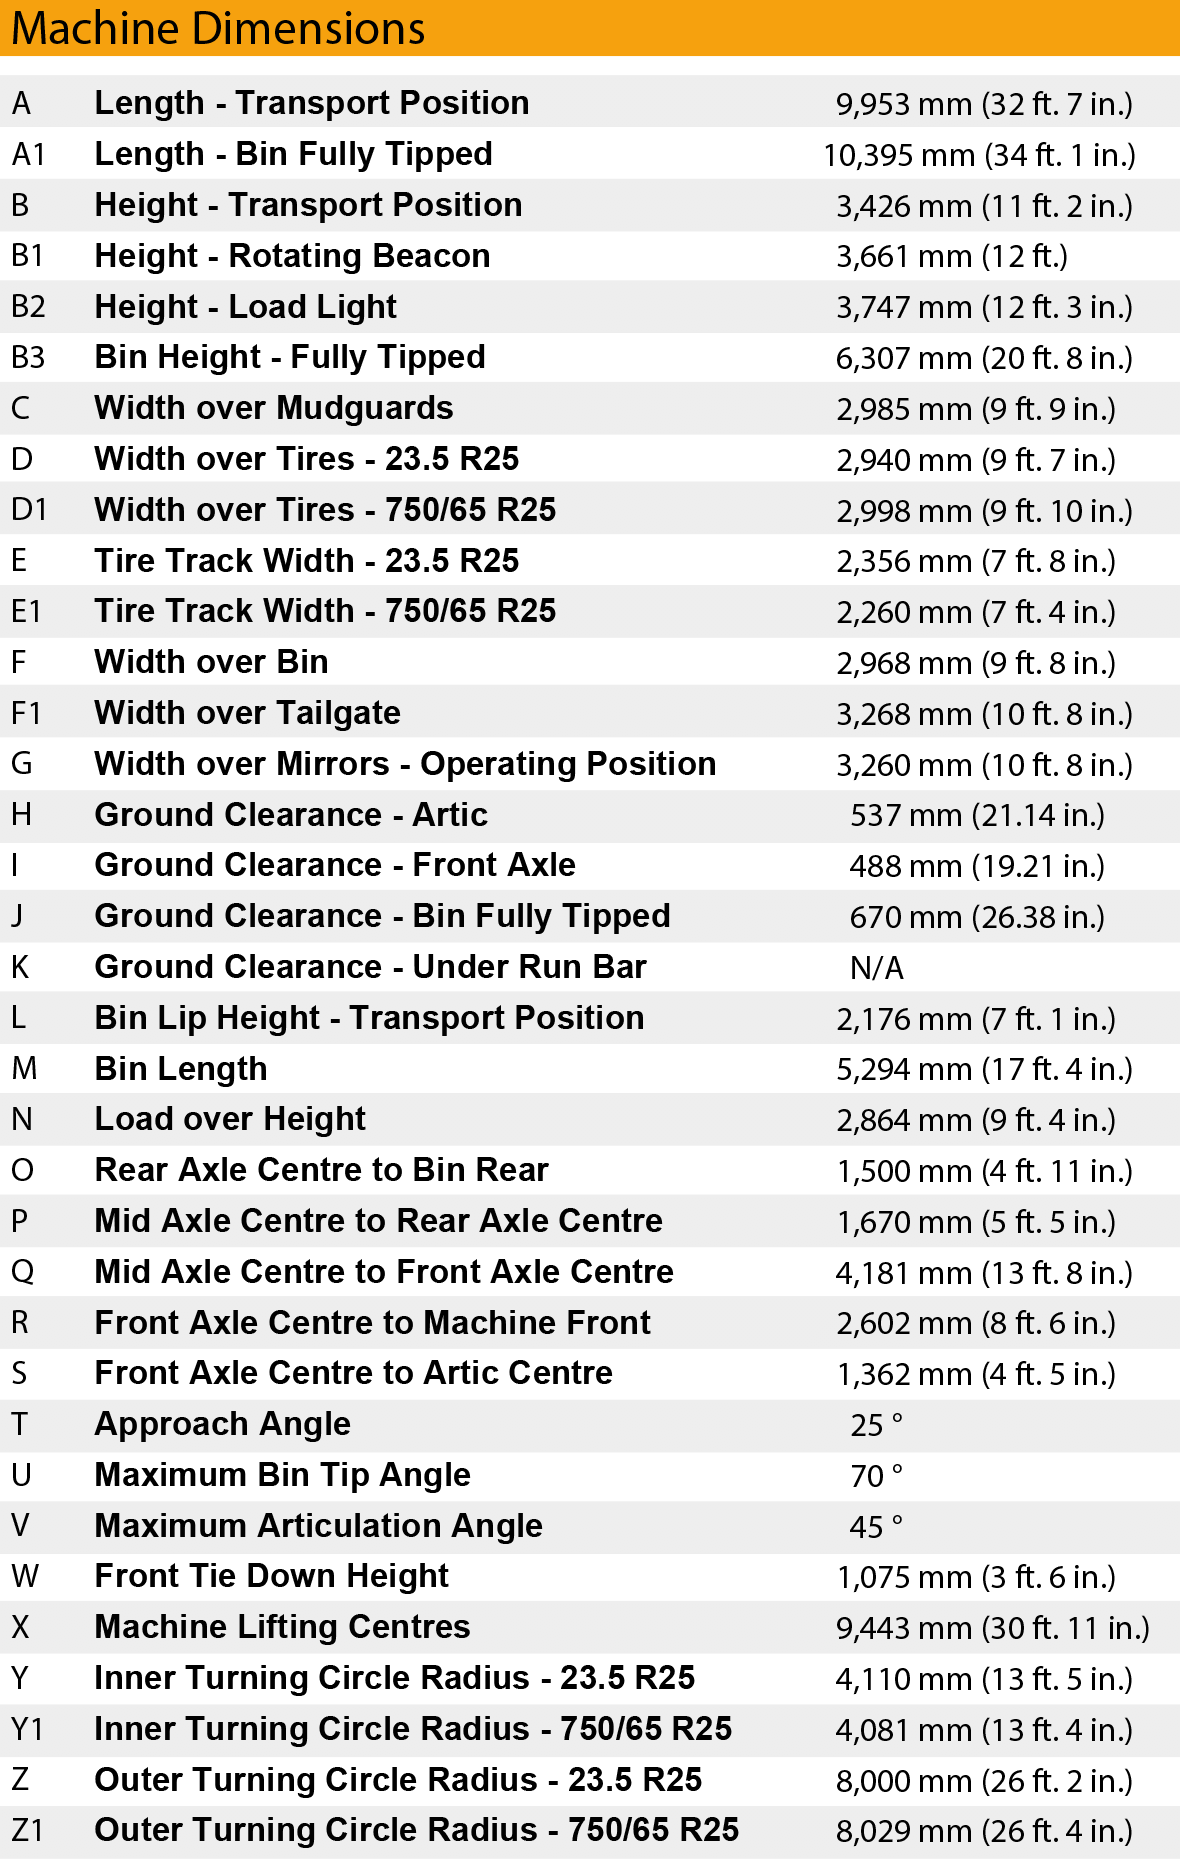 bell b30e truck dimensions chart